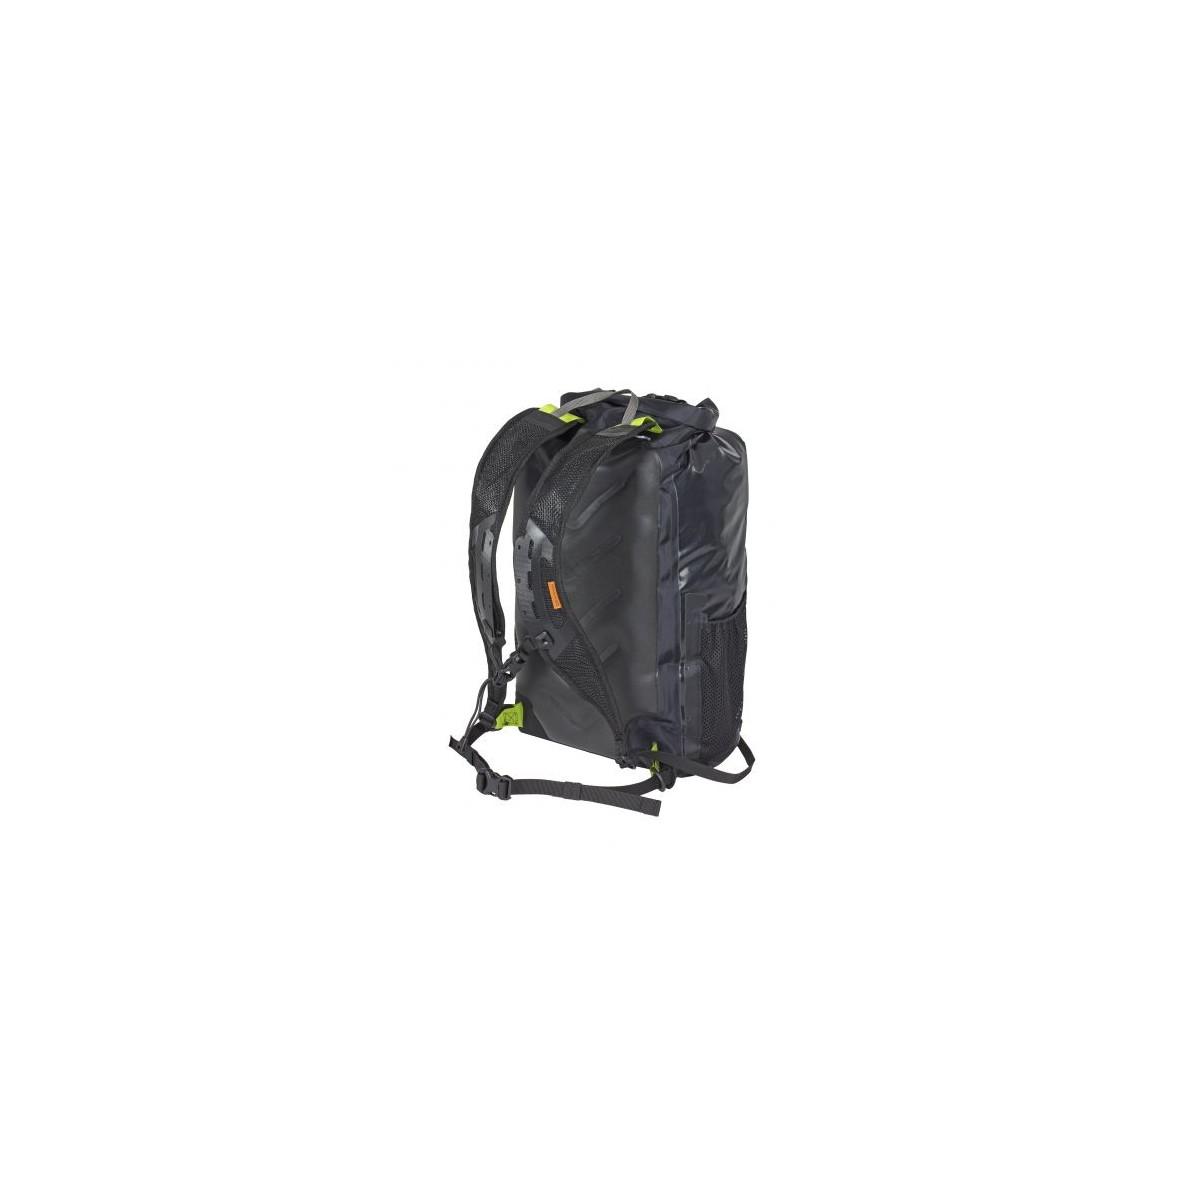 Mugursomas Ortlieb Light Pack Pro 25 L